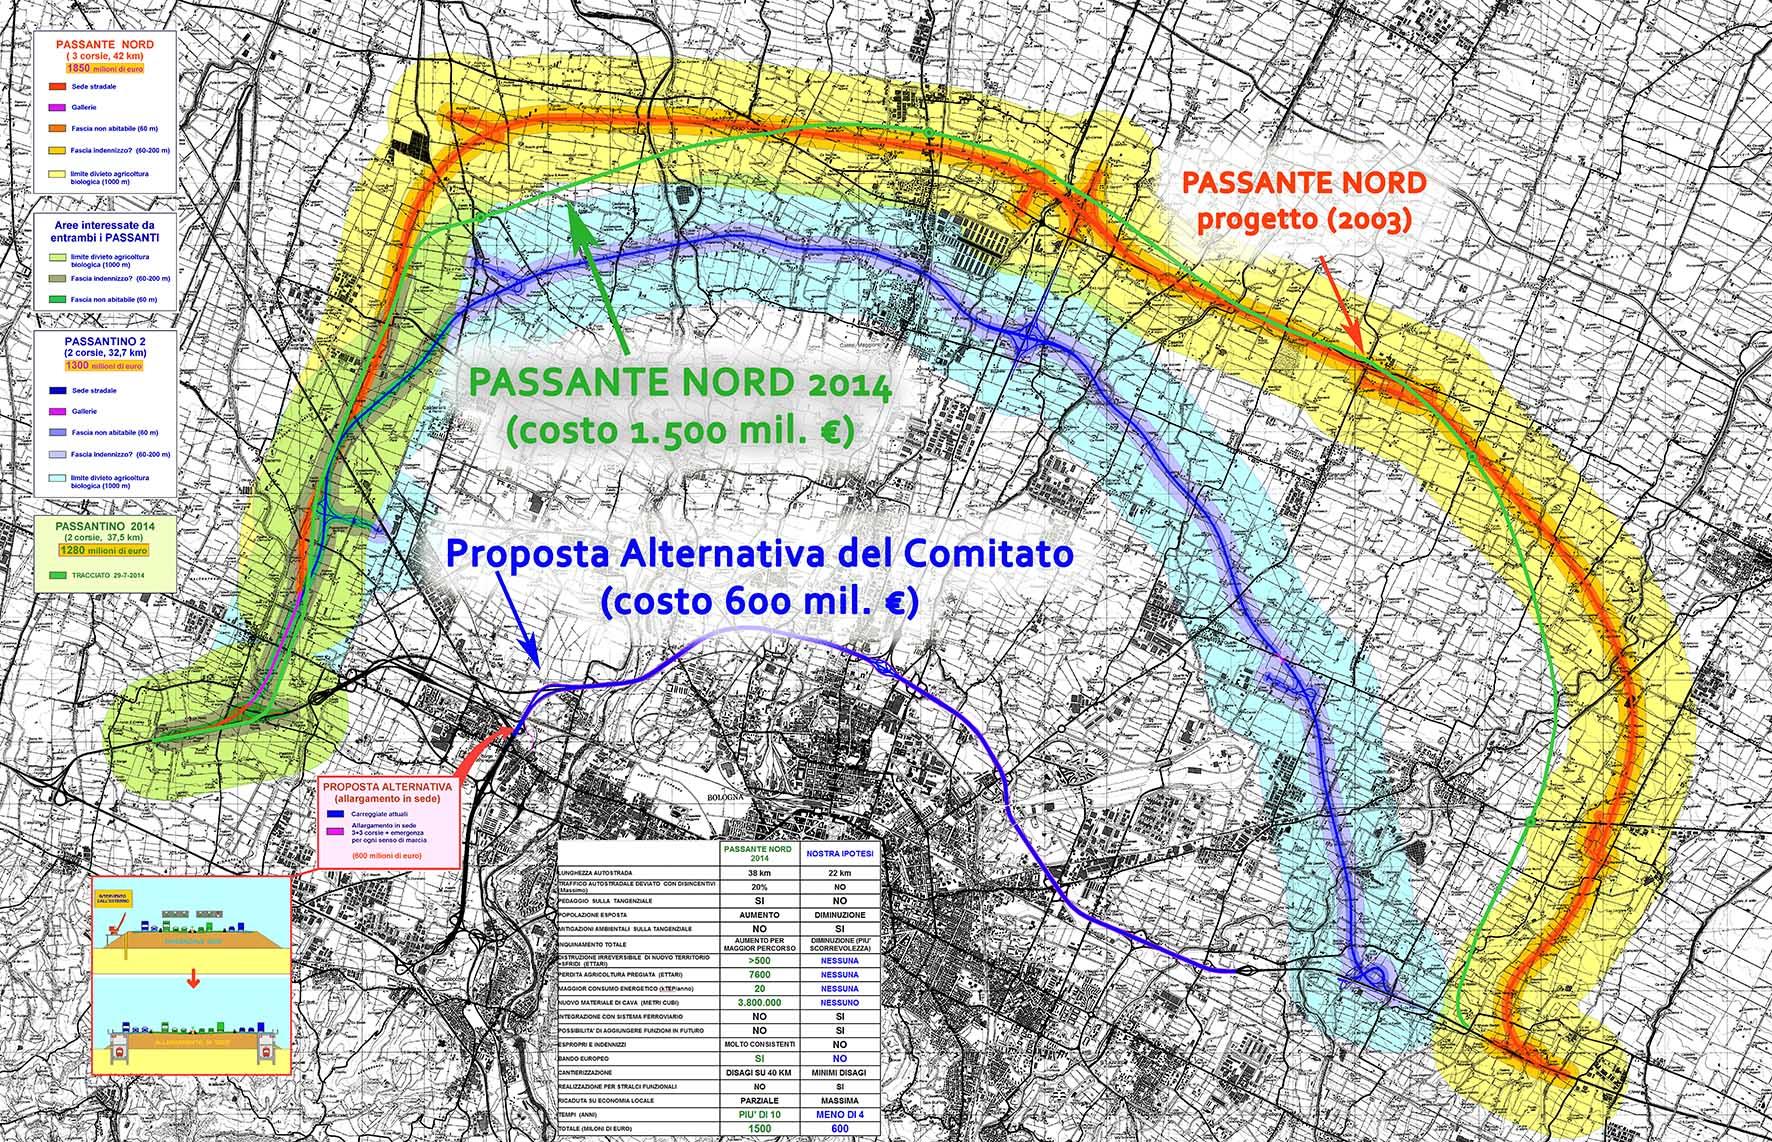 passante nord bologna